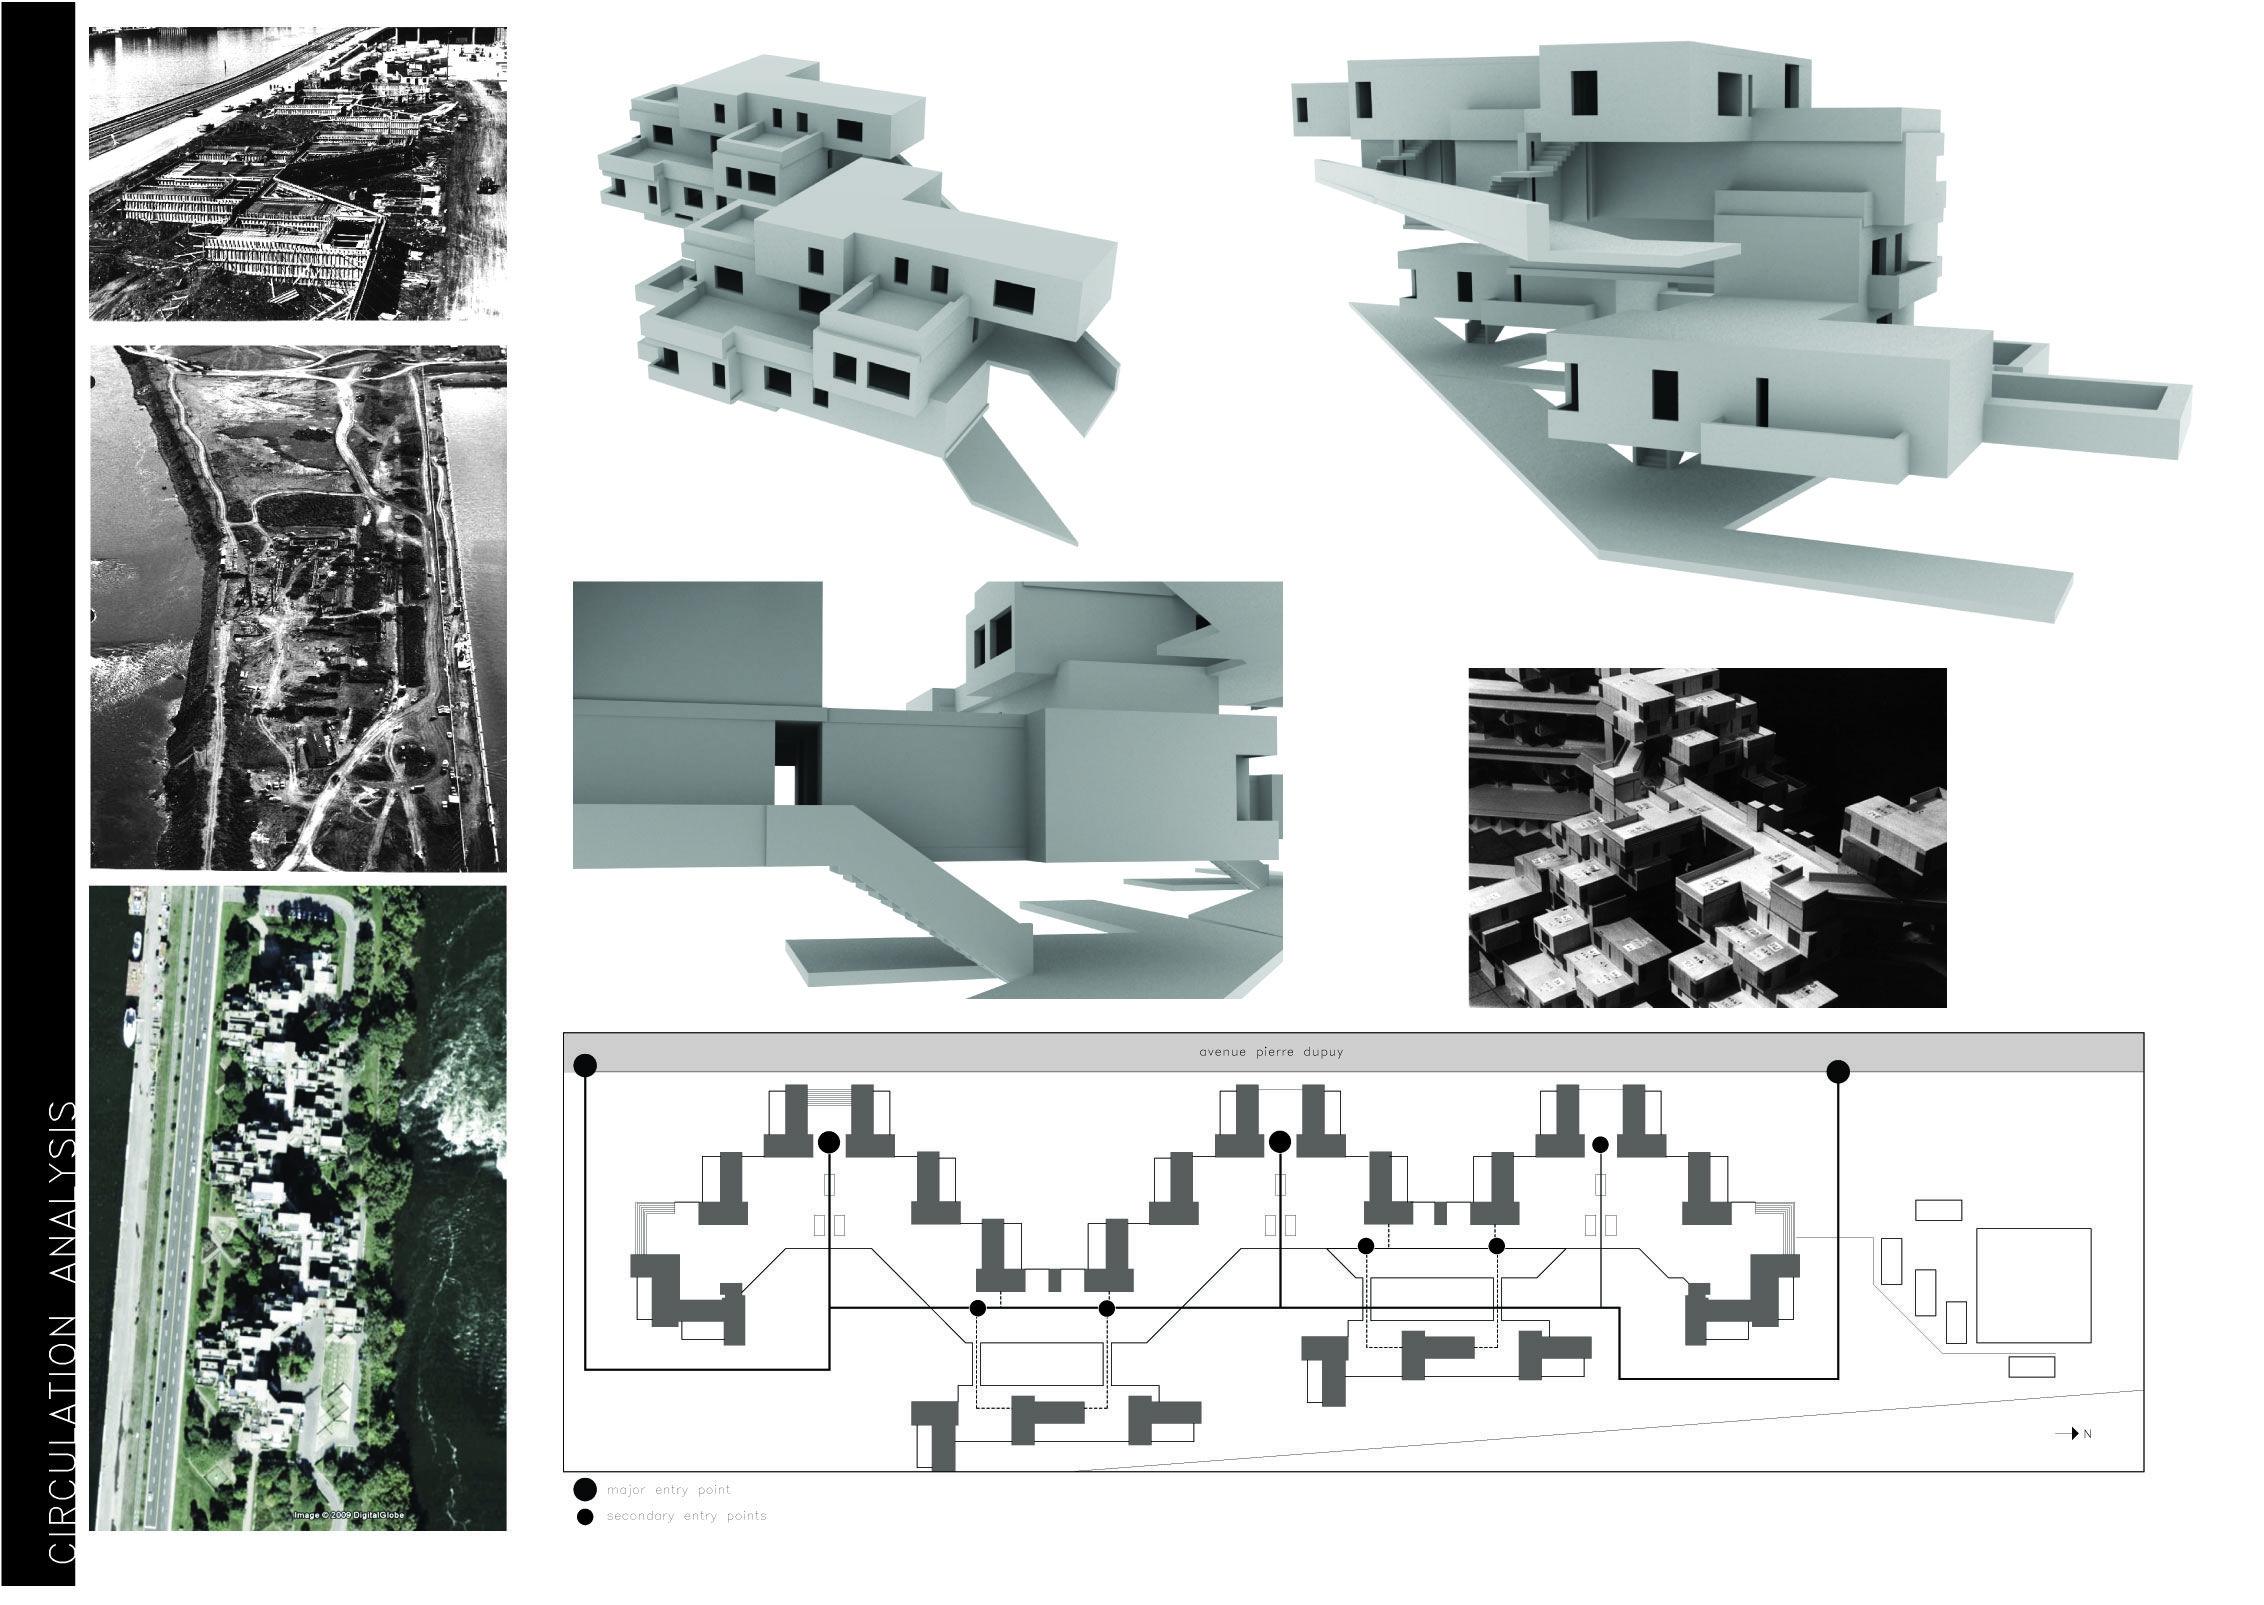 project 1b: Habitat '67 | Architecture